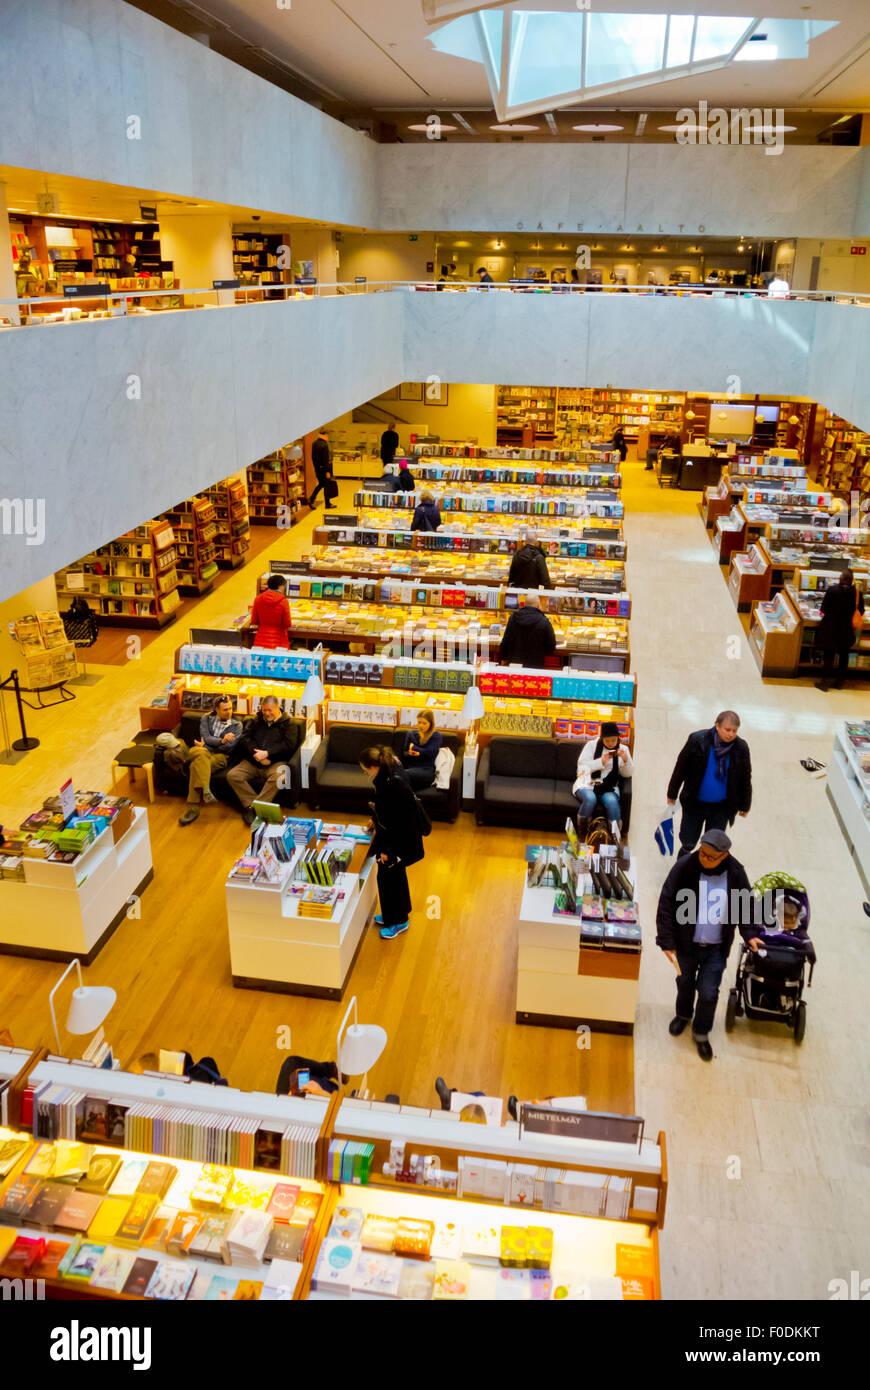 Akateeminen kirjakauppa, Academic bookstore, designed by Alvar Aalto, Helsinki, Finland - Stock Image